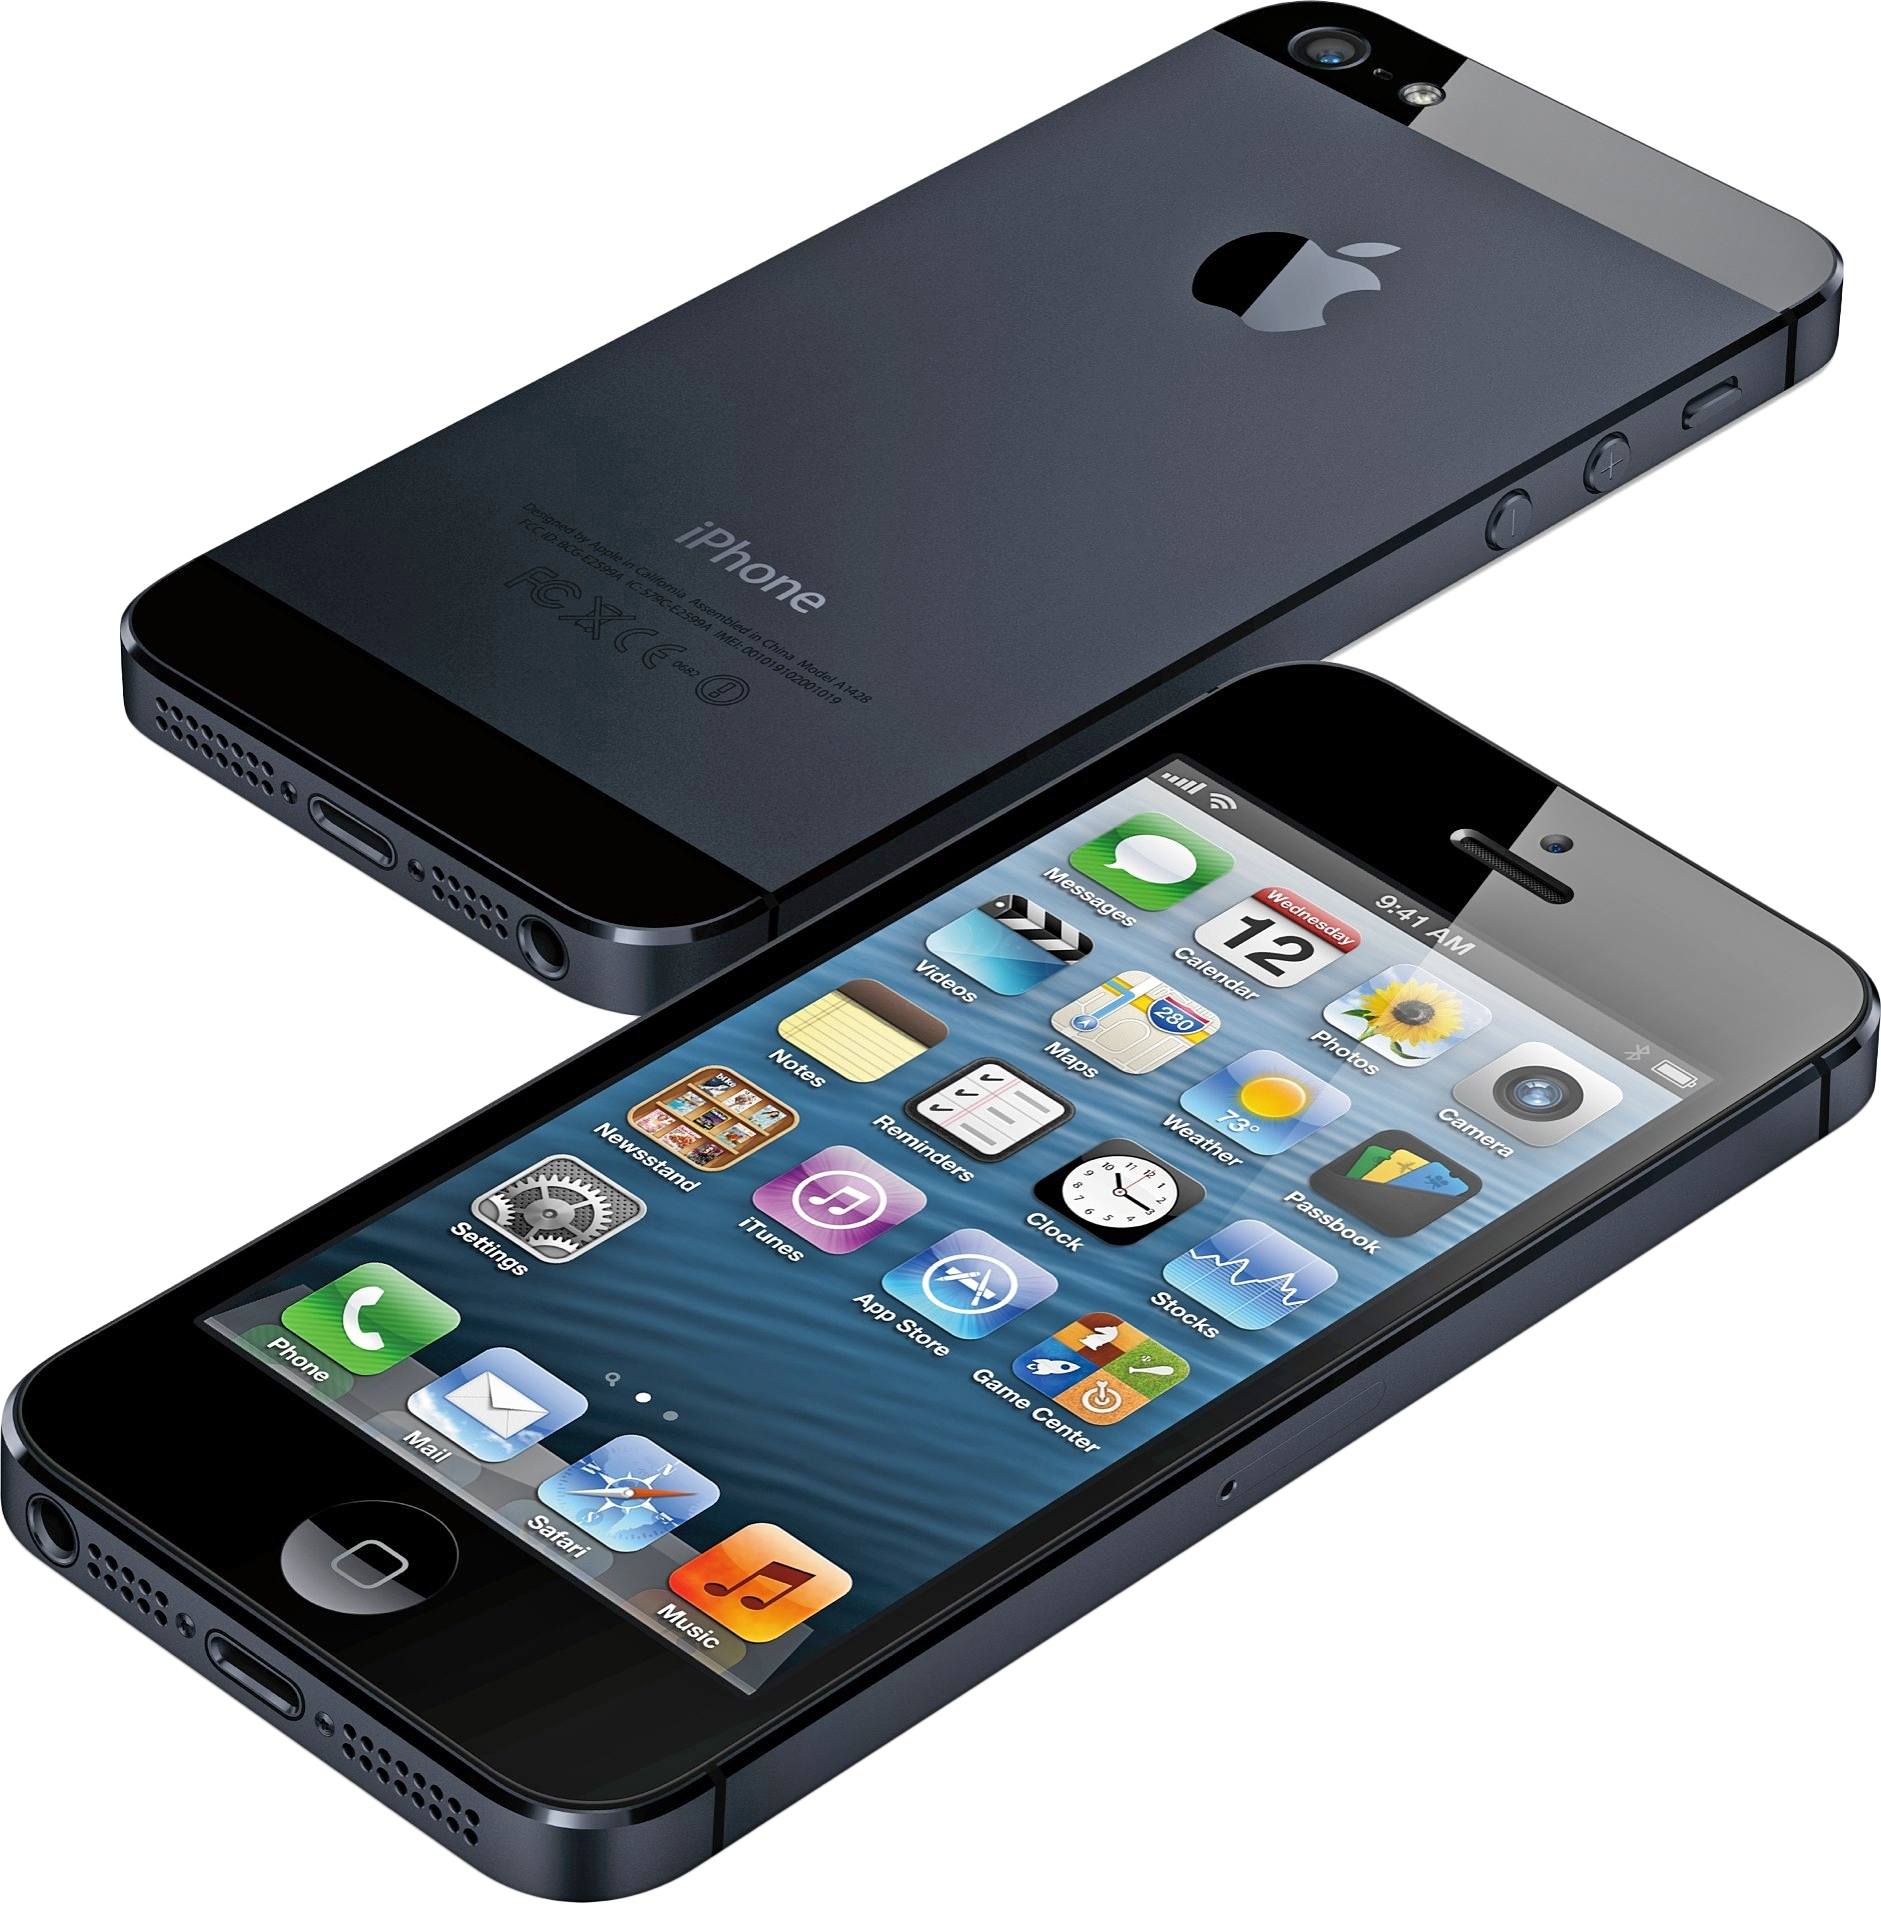 35decb4fd Apple iPhone 5 64GB Black